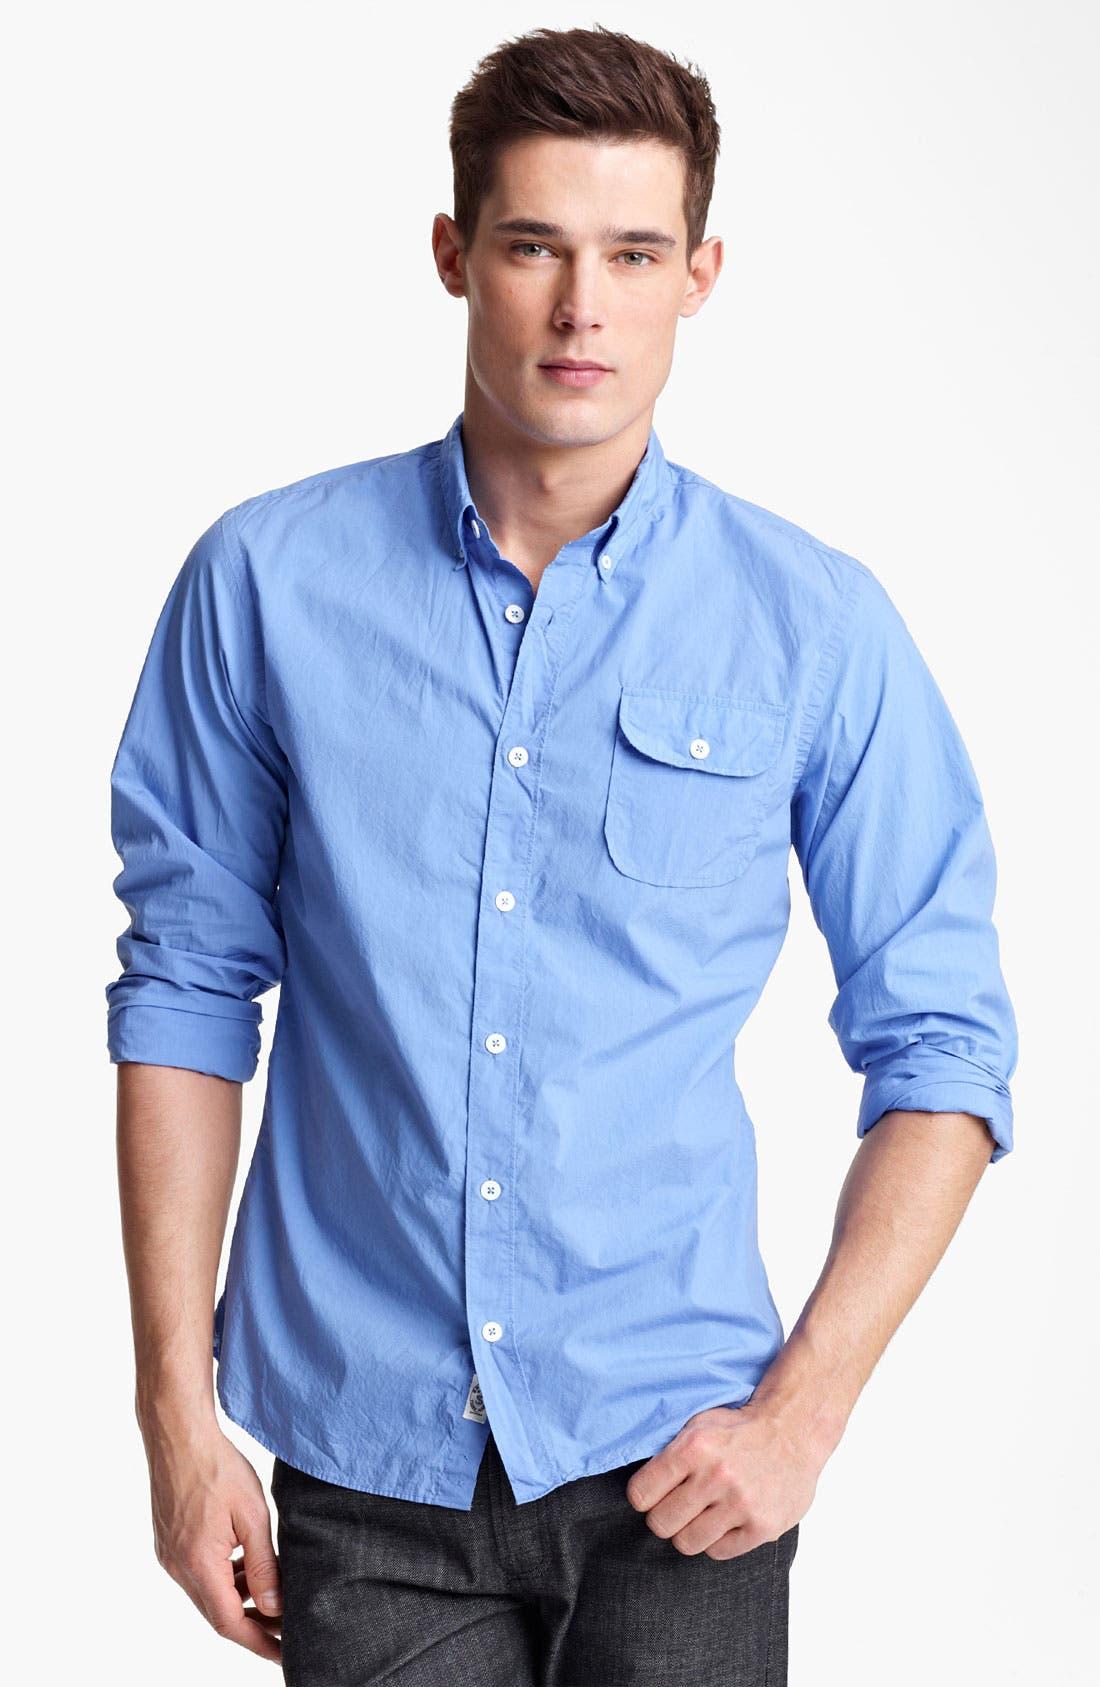 Alternate Image 1 Selected - Todd Snyder Cotton Poplin Sport Shirt